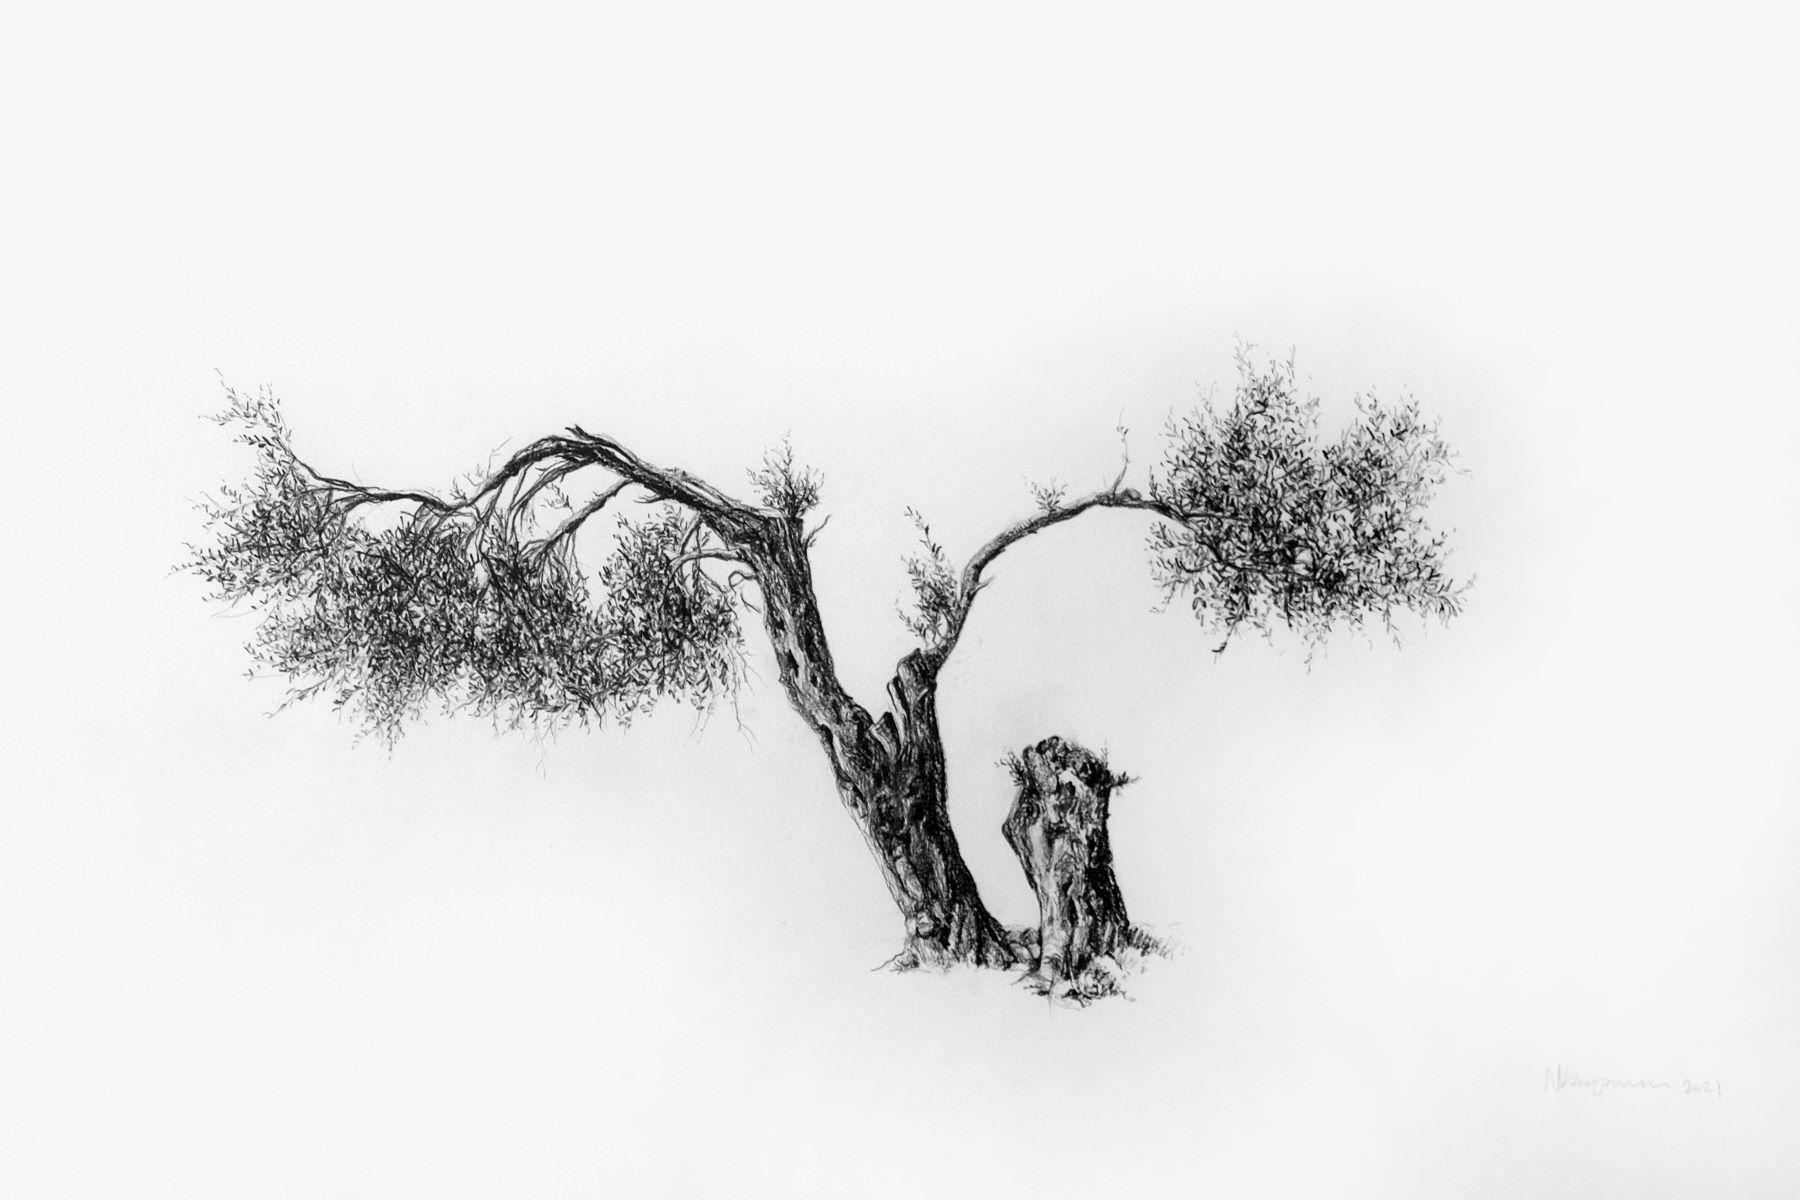 Icarus - Graphite on Arches Paper by artist Neva Bergemann